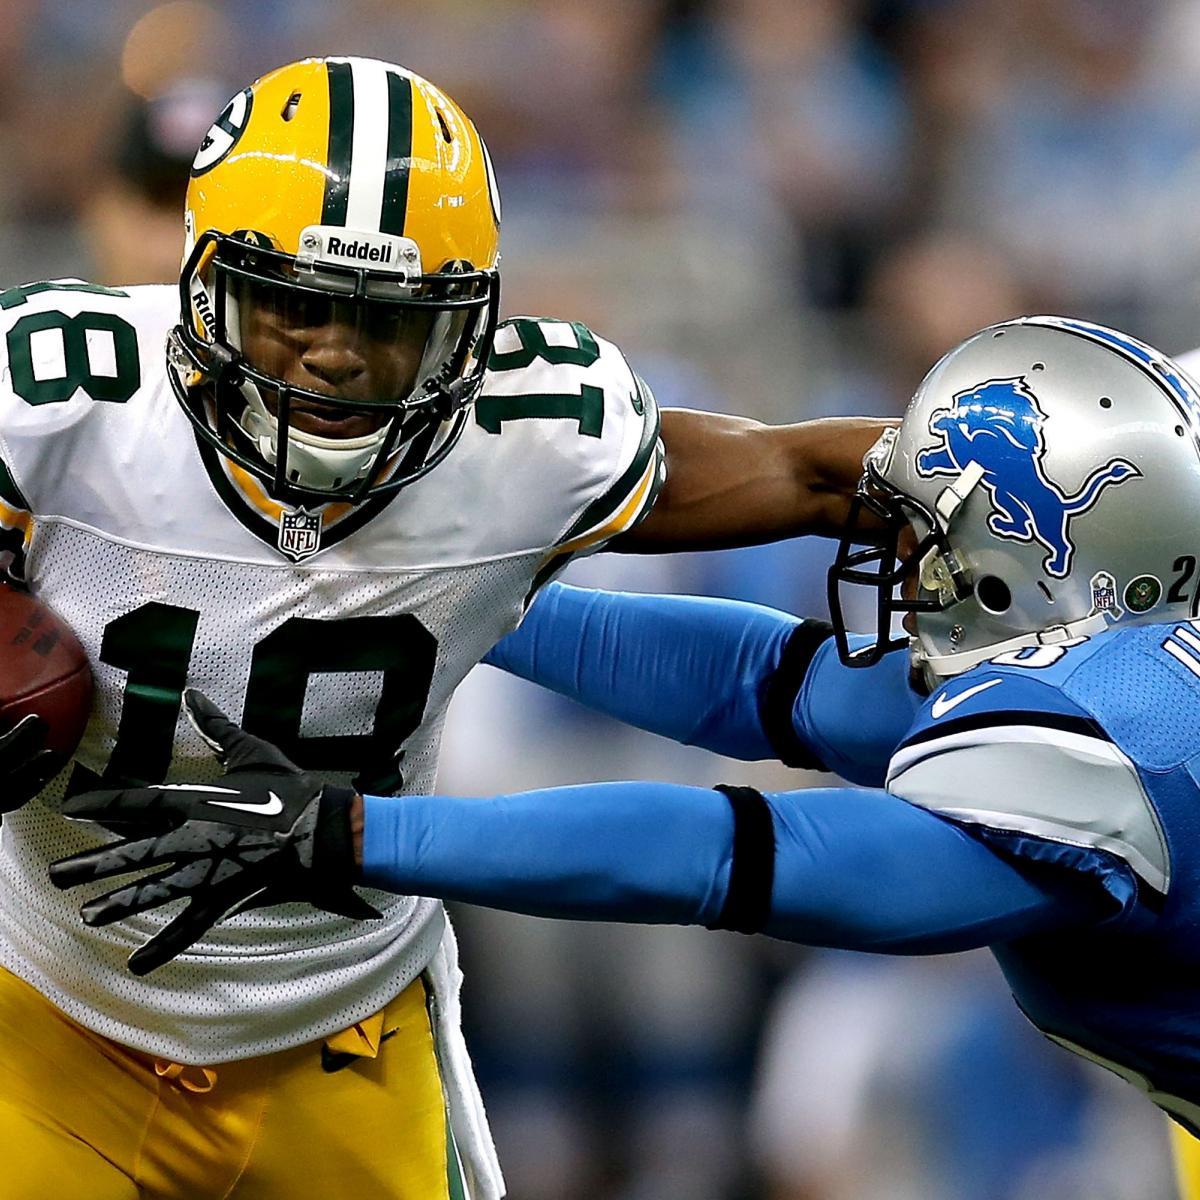 Week 11 Giants Vs Packers: Packers Vs. Giants: Full Preview, Predictions & Analysis